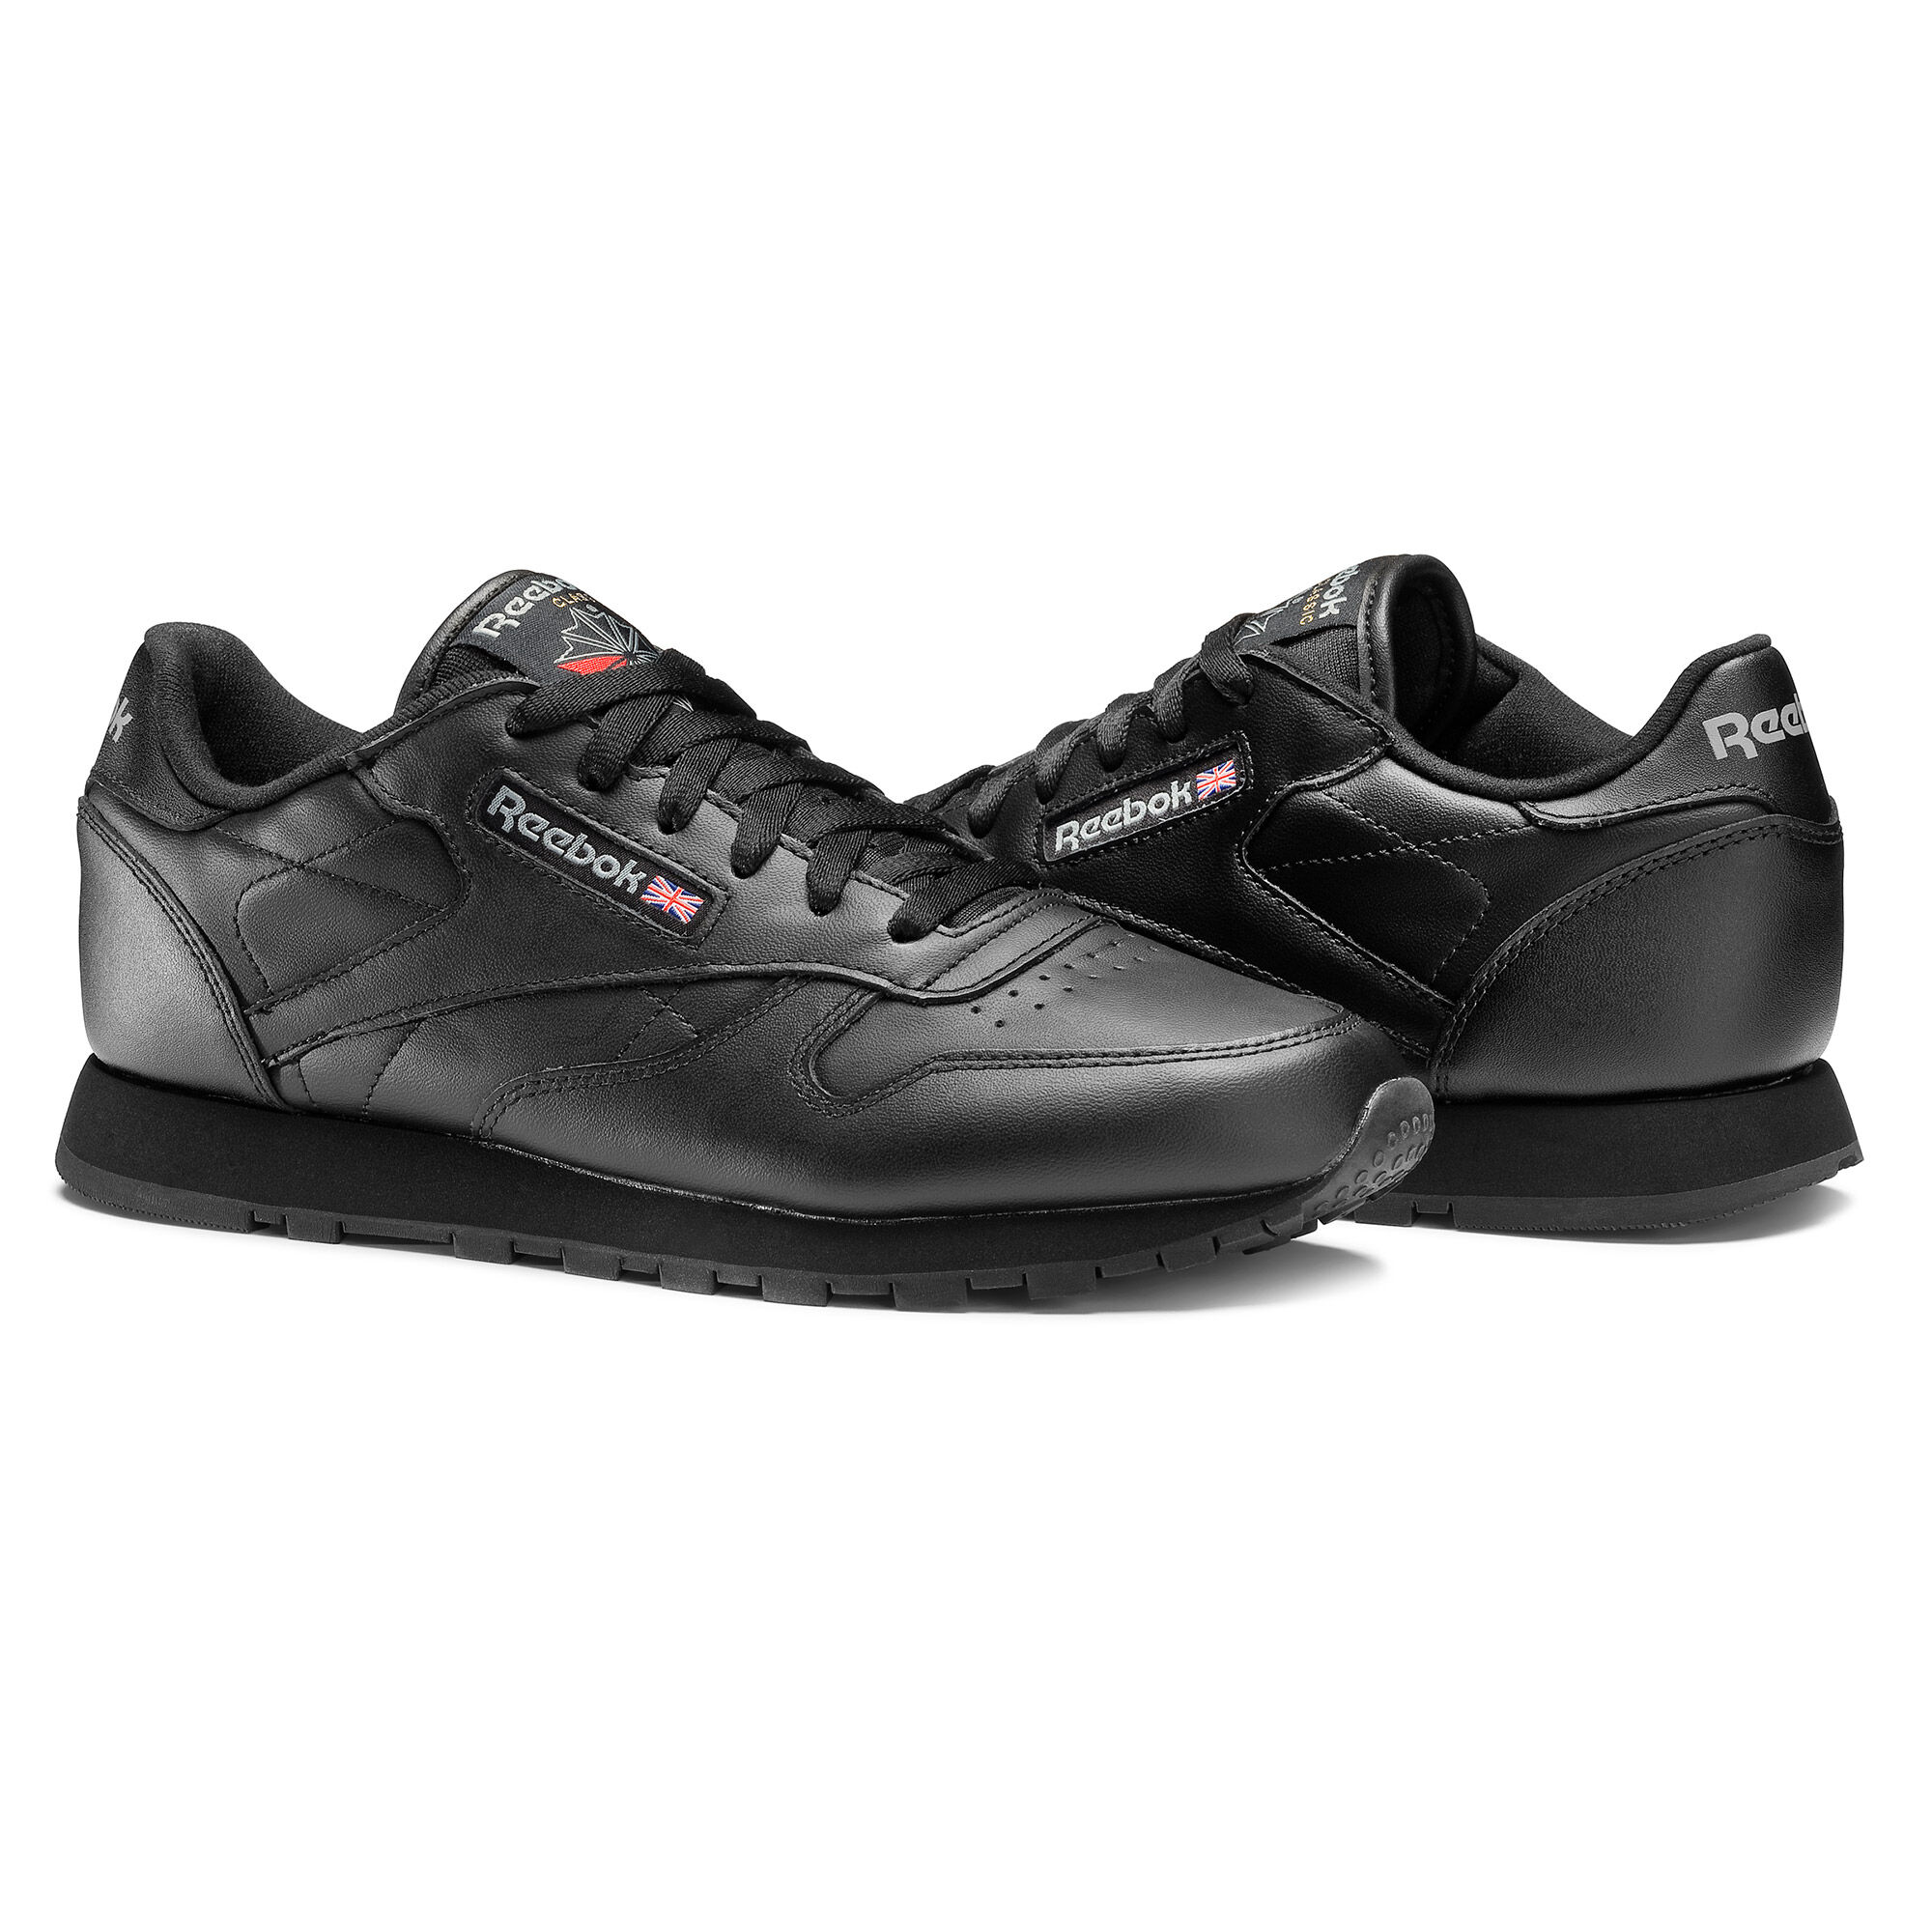 Reebok - Classic Leather Intense Black 3912